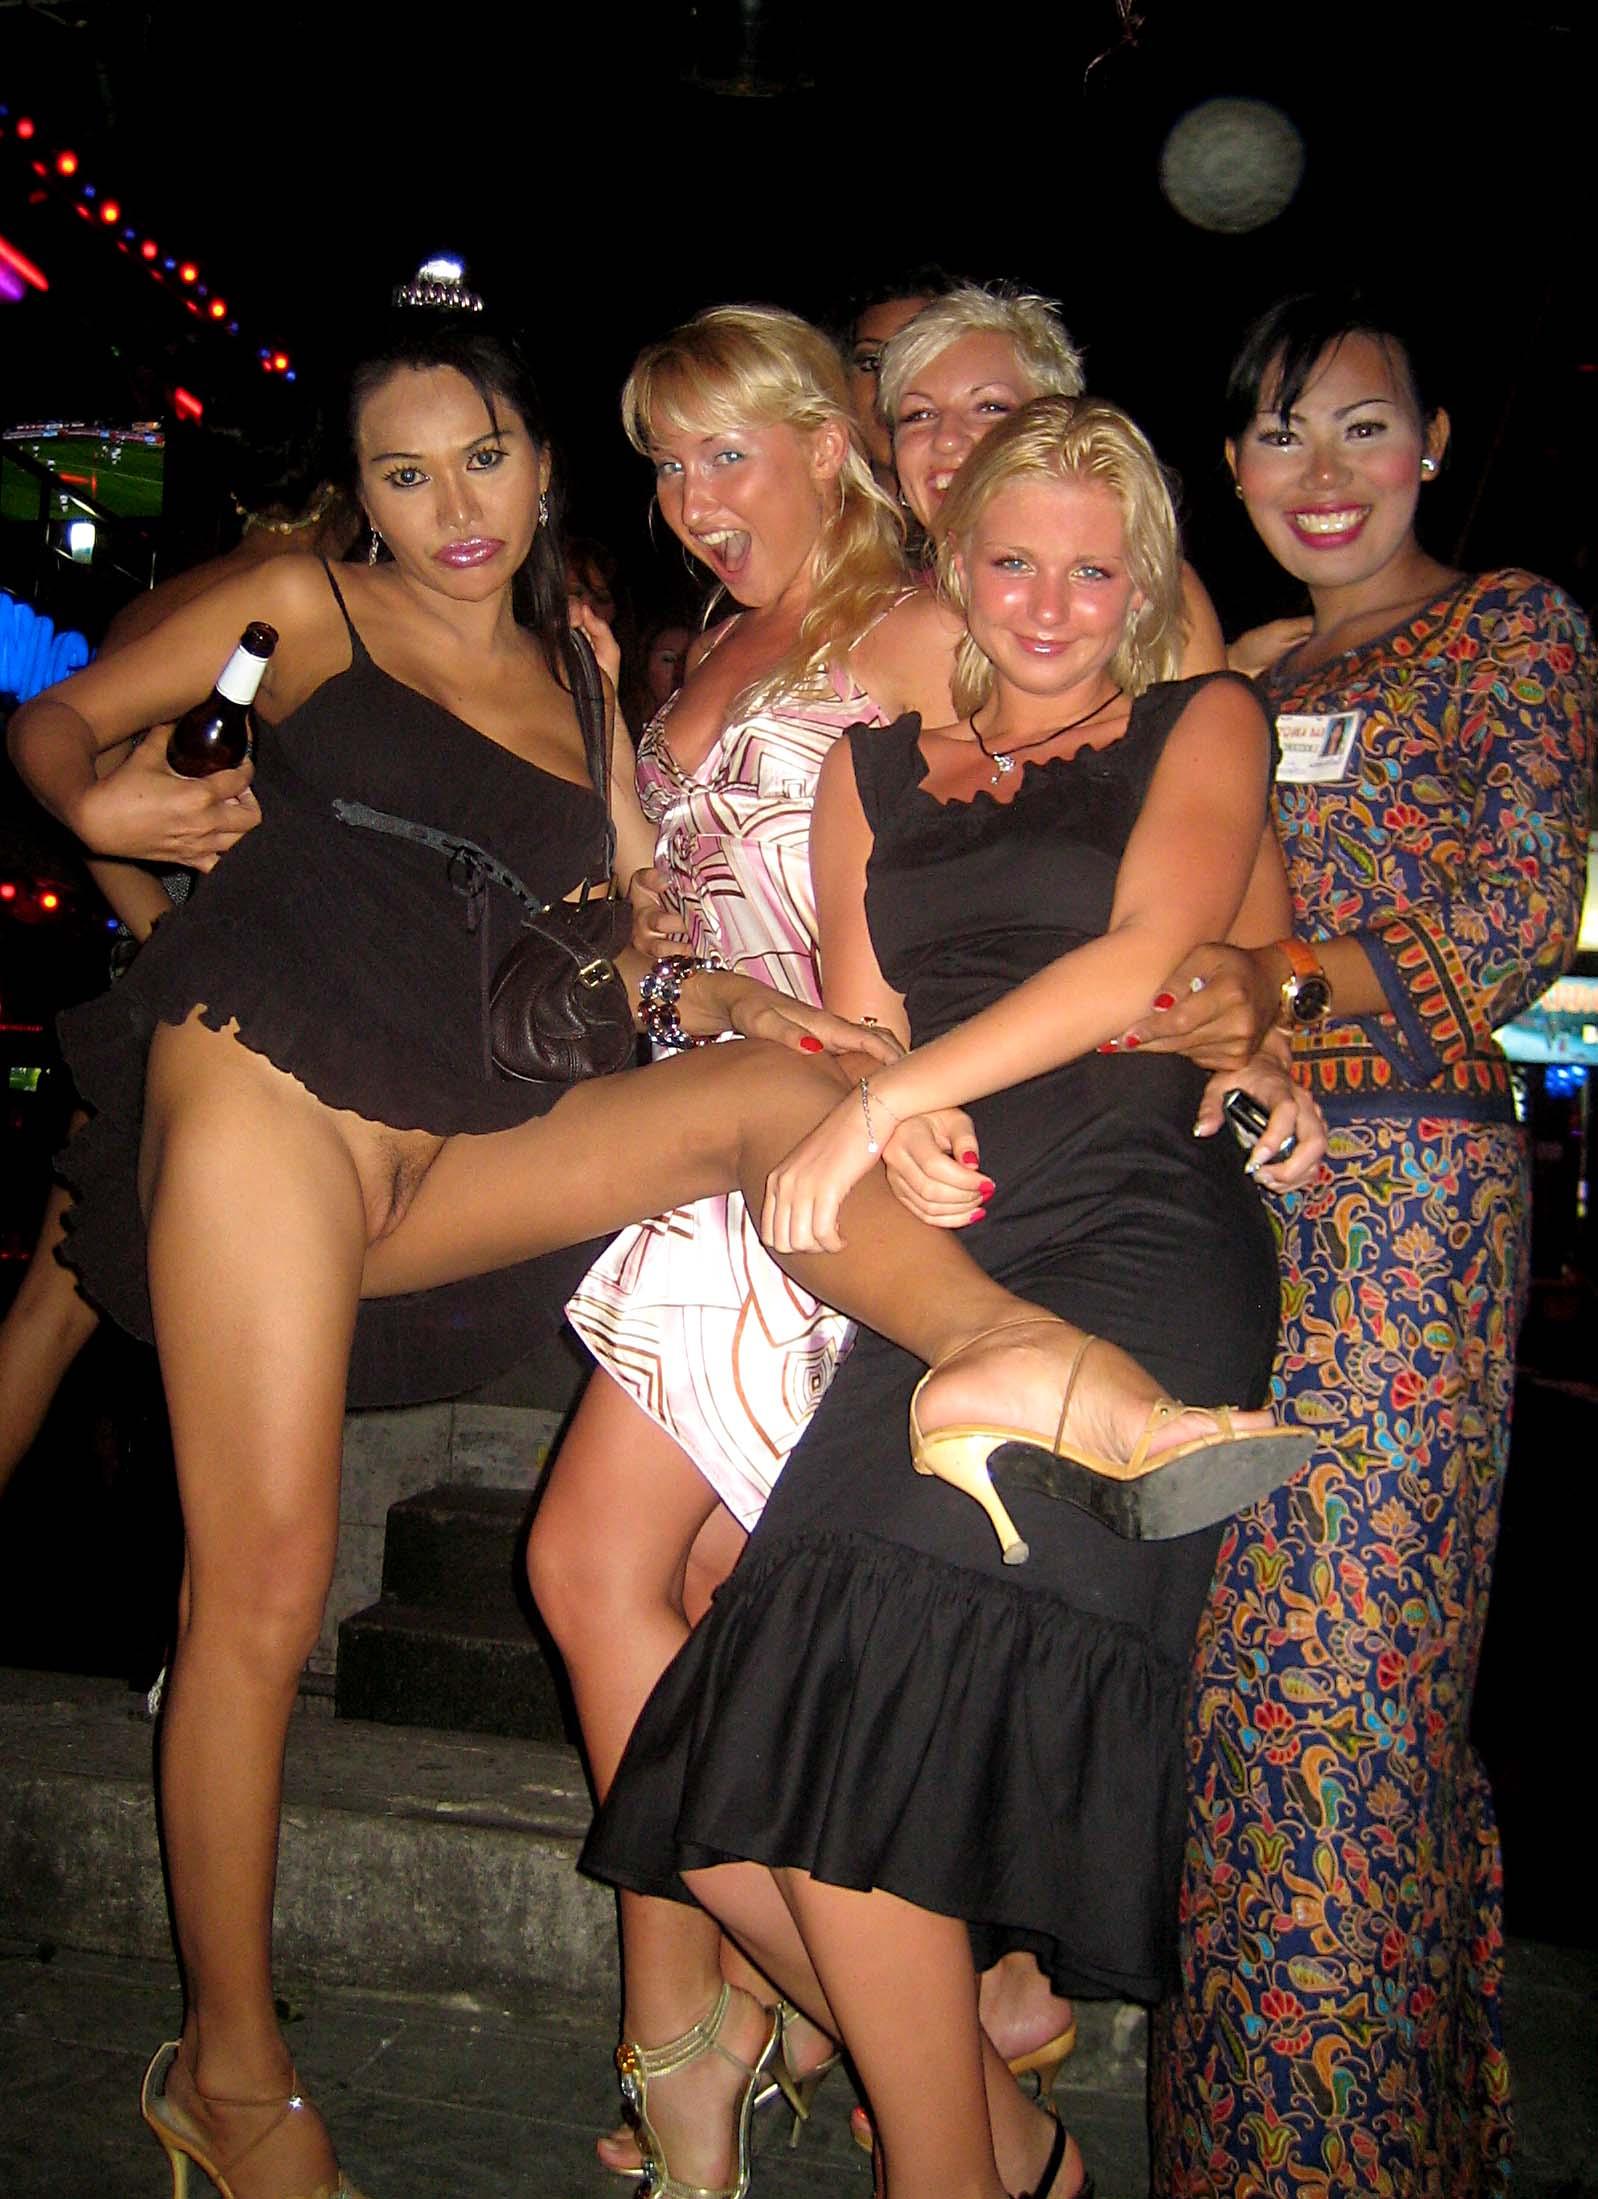 seks-video-rolik-porno-v-pattaye-doma-russkie